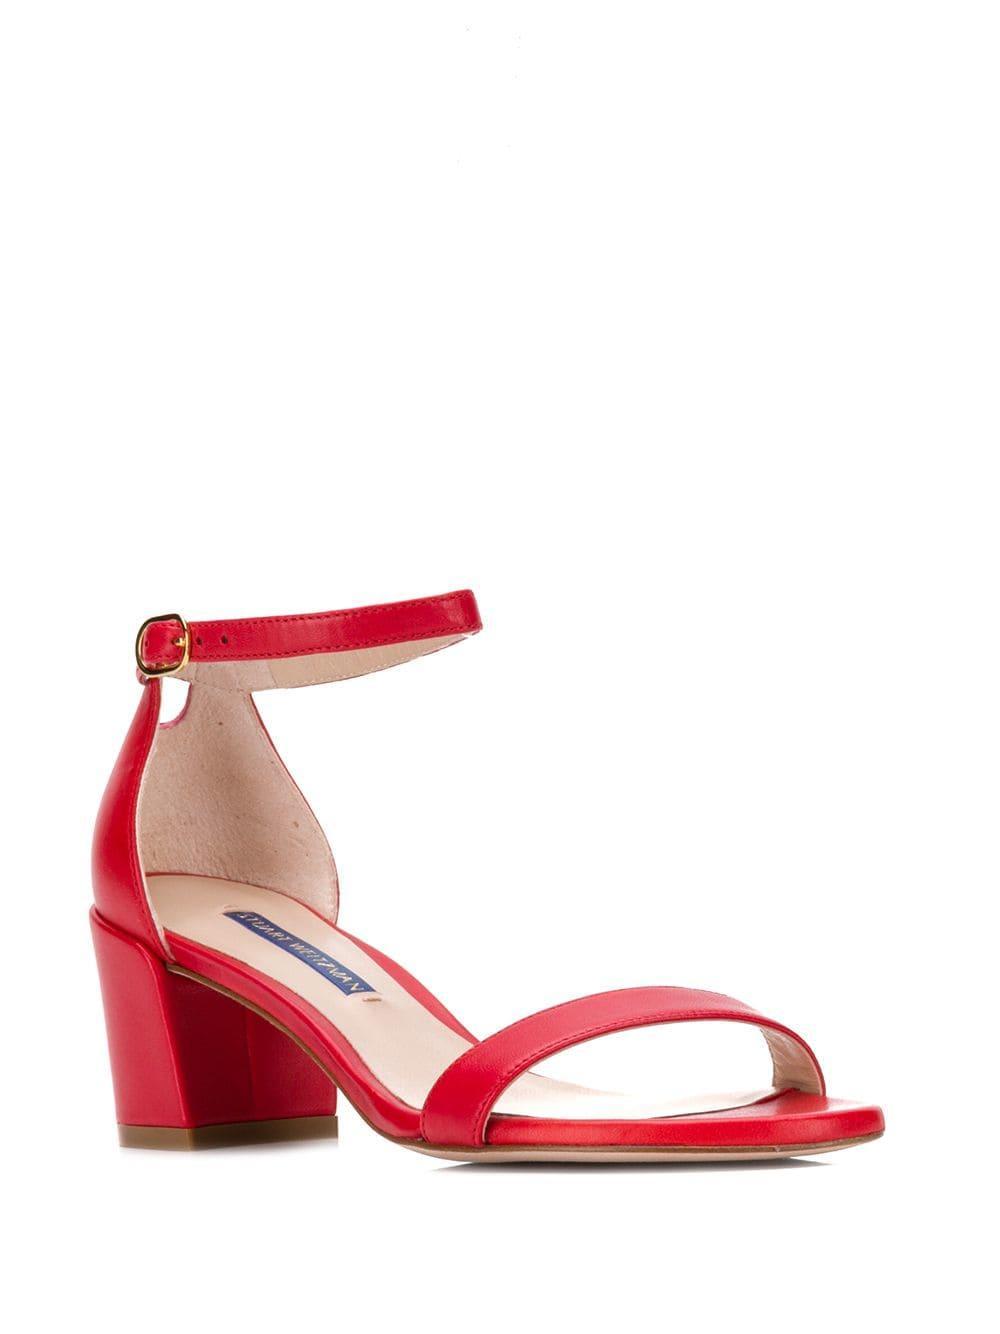 02cdef4f042 Stuart Weitzman - Red Simple Block Heel Sandals - Lyst. View fullscreen